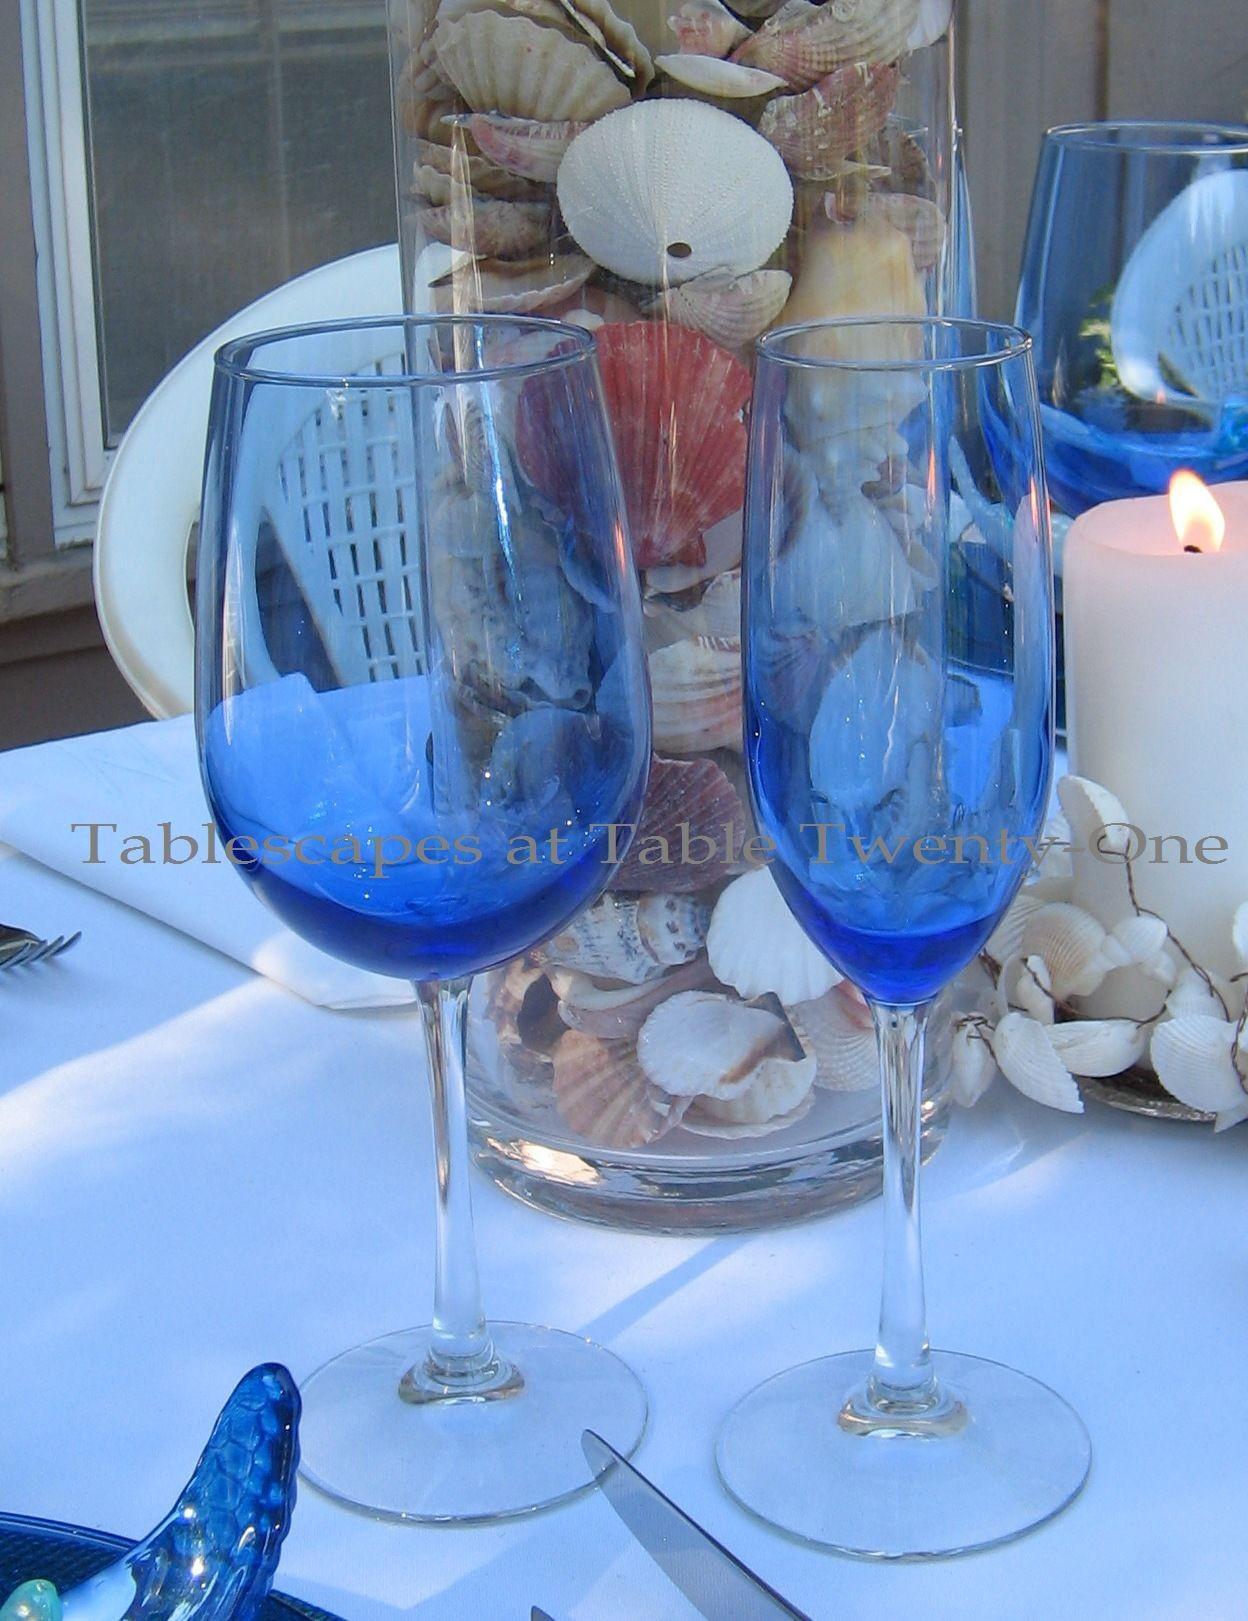 Tablescapes at Table Twenty-One, www.tabletwentyone.wordpress.com, Ocean Blue – Starfish & Seashells:  Cobalt blue stemware from Dollar Tree